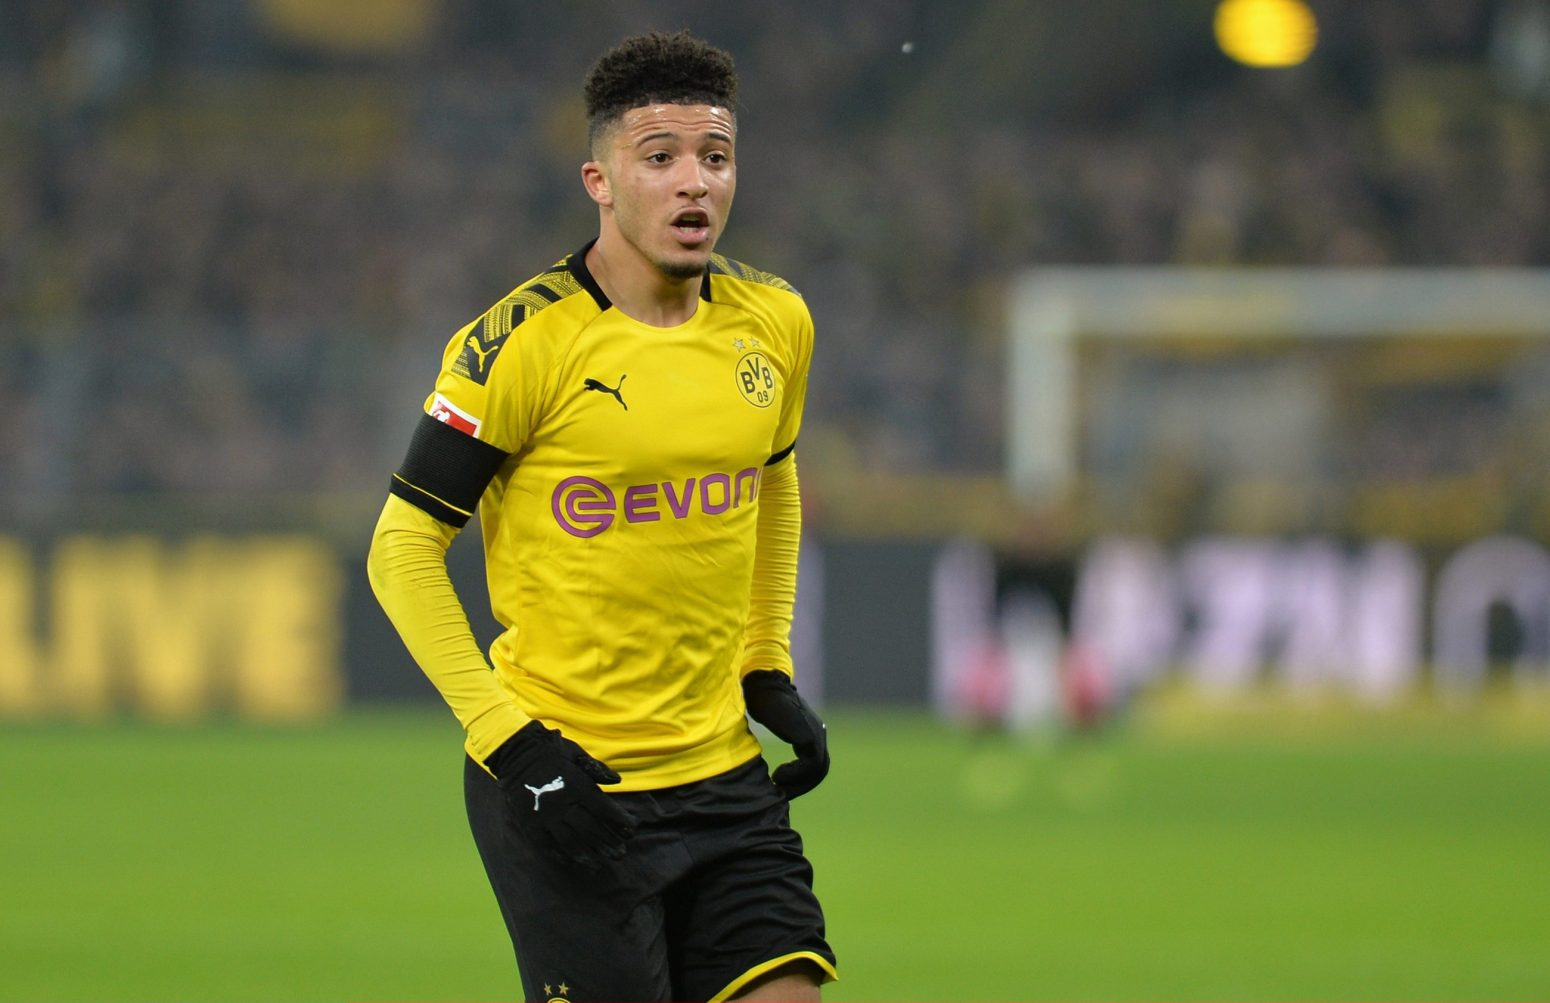 Journalist confirms Liverpool's interest in £100m deal for Dortmund star Jadon Sancho